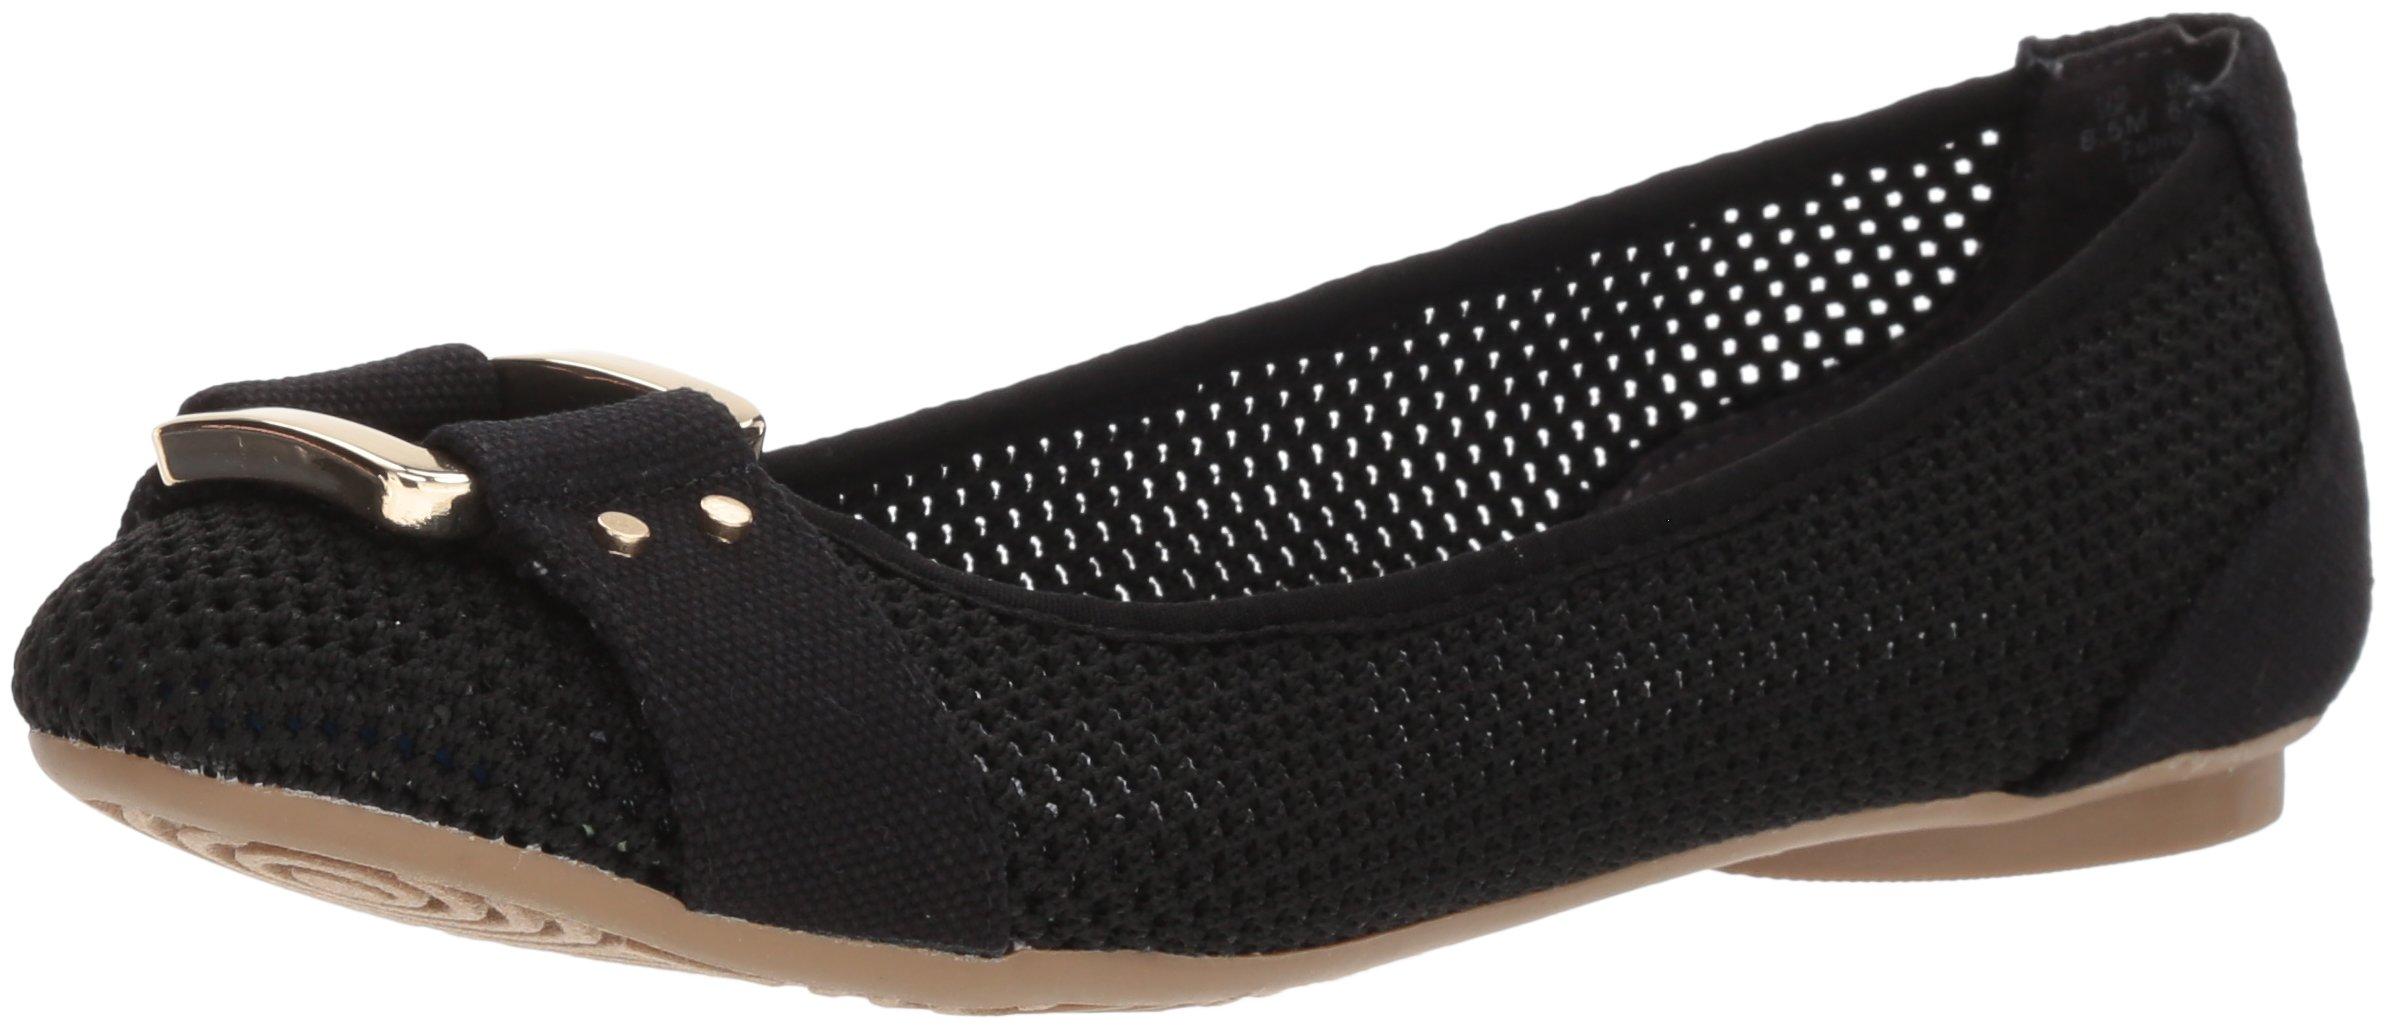 4e30d35dde35d Cheap Frankie Shoes, find Frankie Shoes deals on line at Alibaba.com